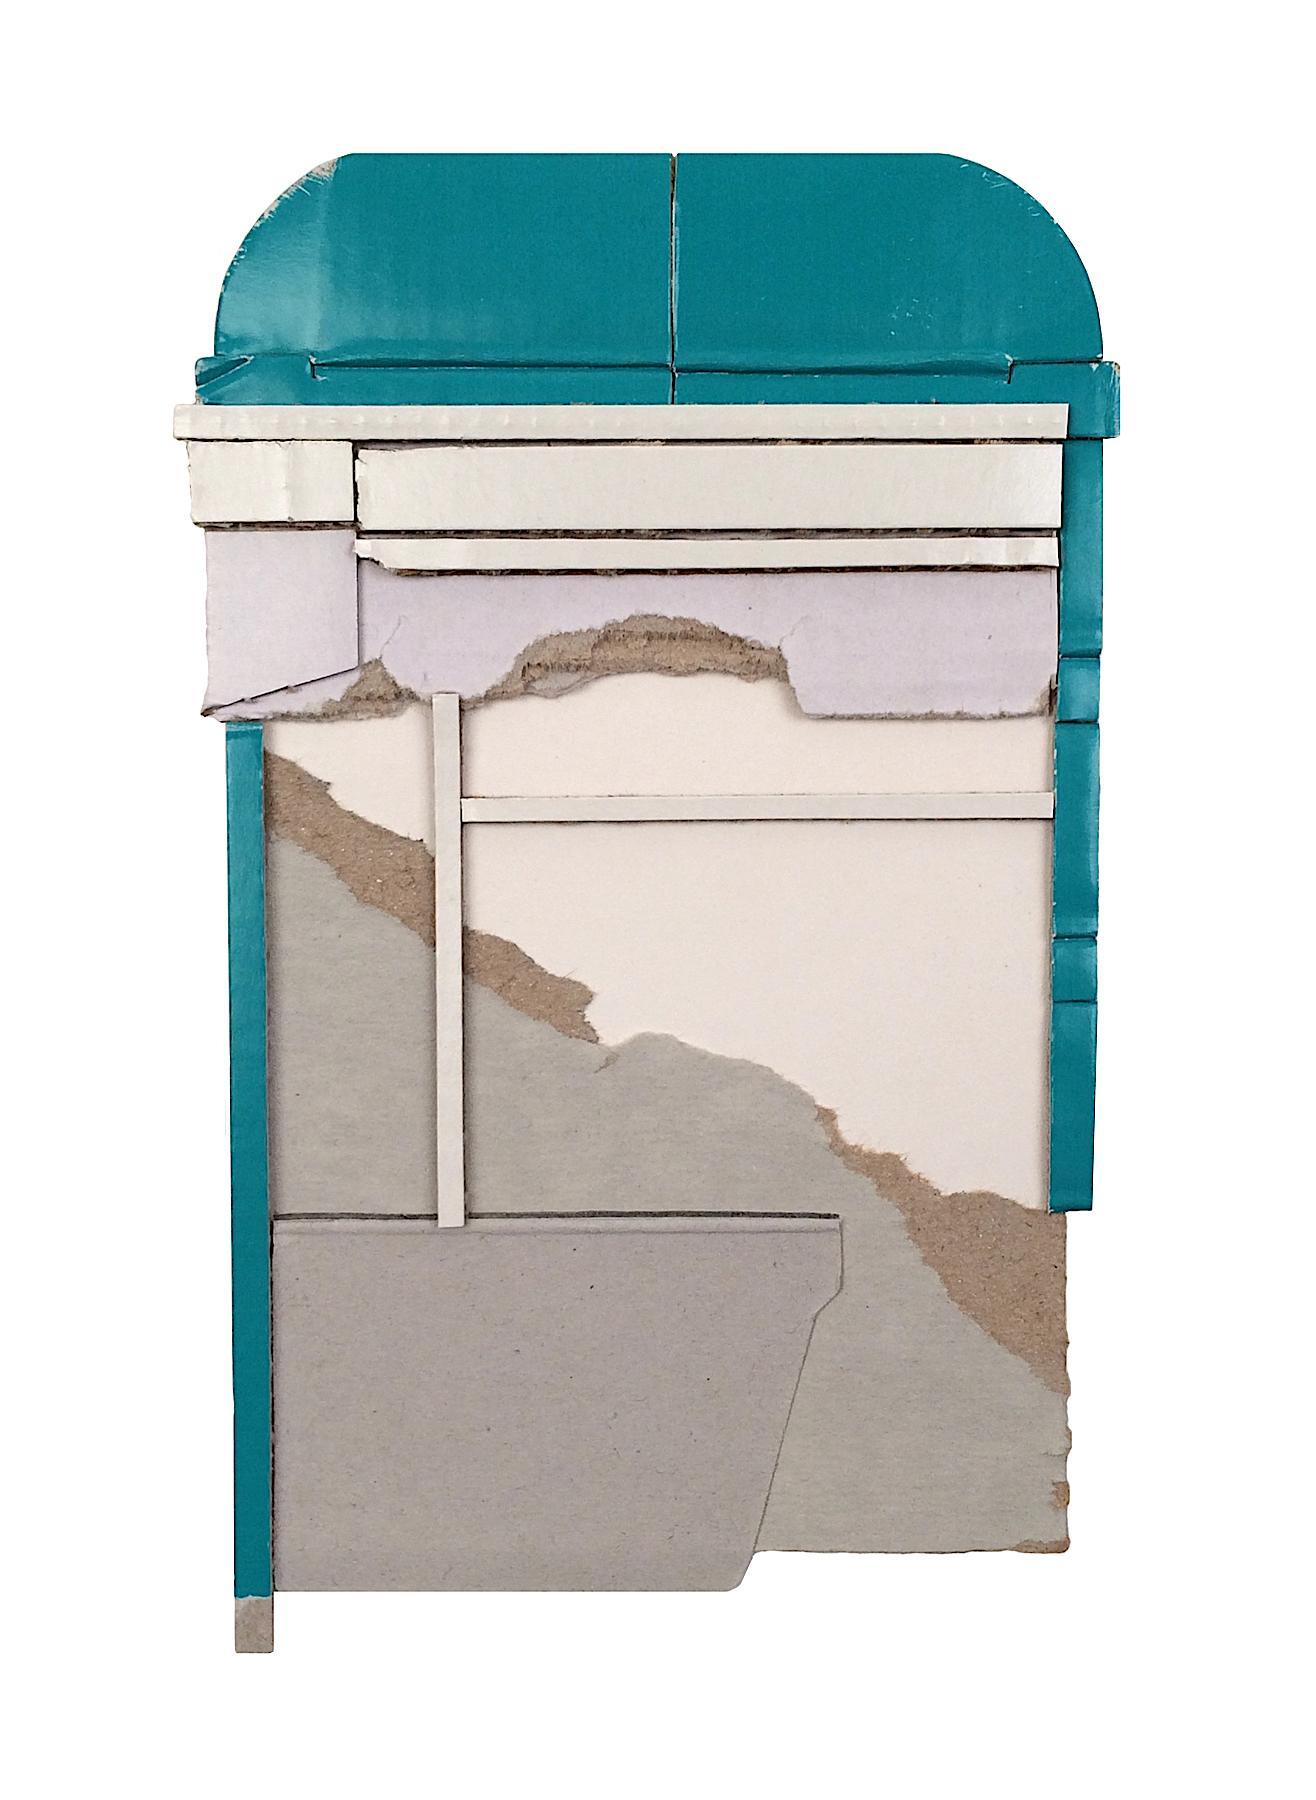 Ryan Sarah Murphy, After, 2012, cardboard collage, 7 x 4.25 in